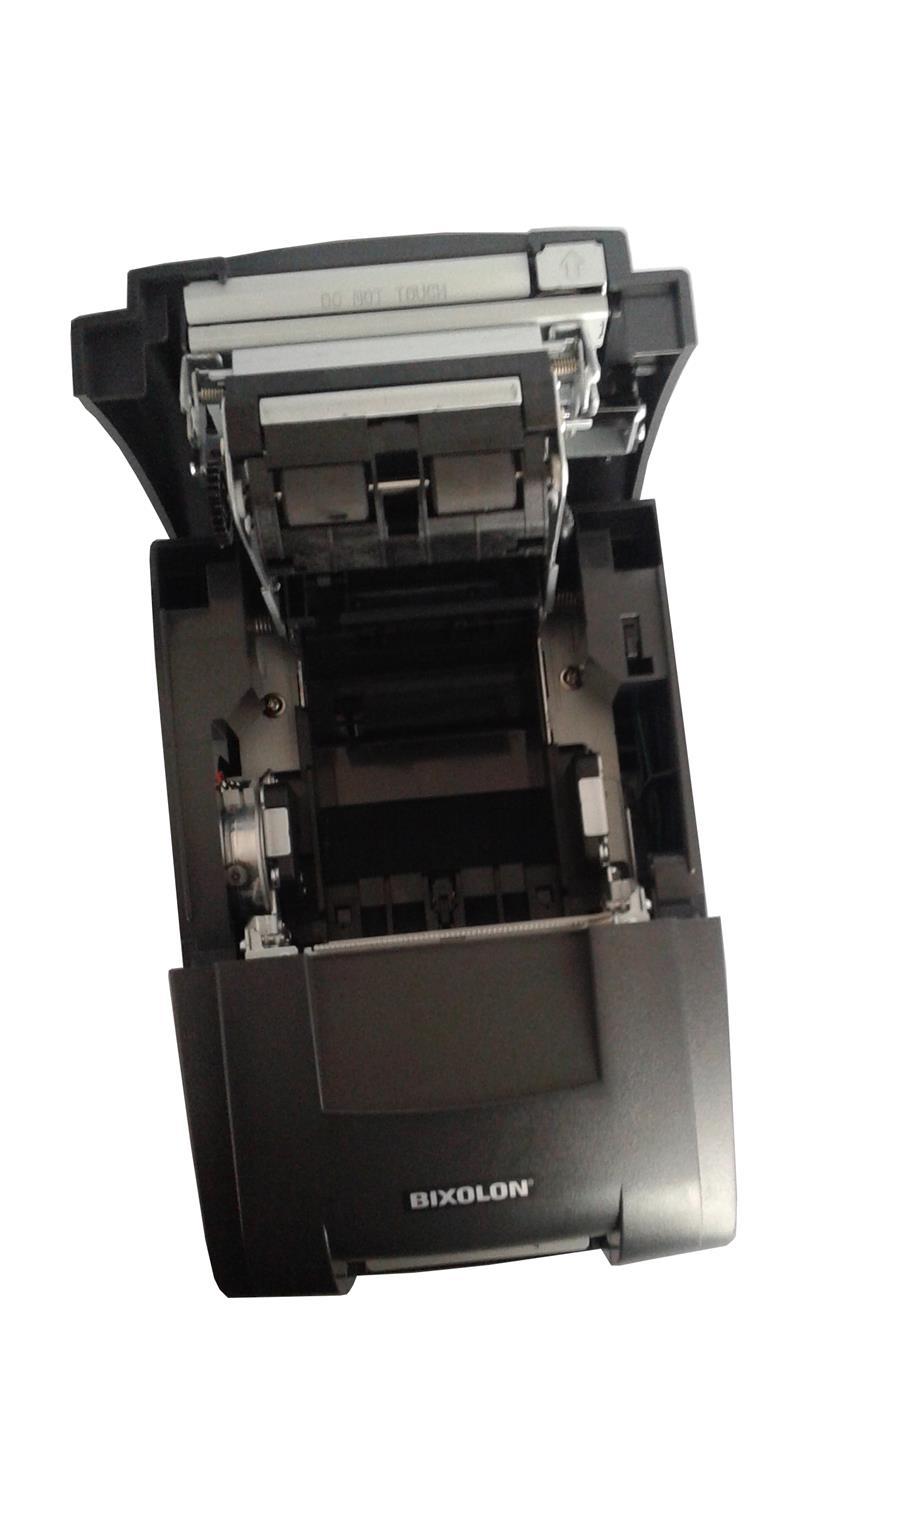 Bixolon Thermal Receipt Printer SRP-275IIICOESG (SERIAL,ETHERNET,USB)